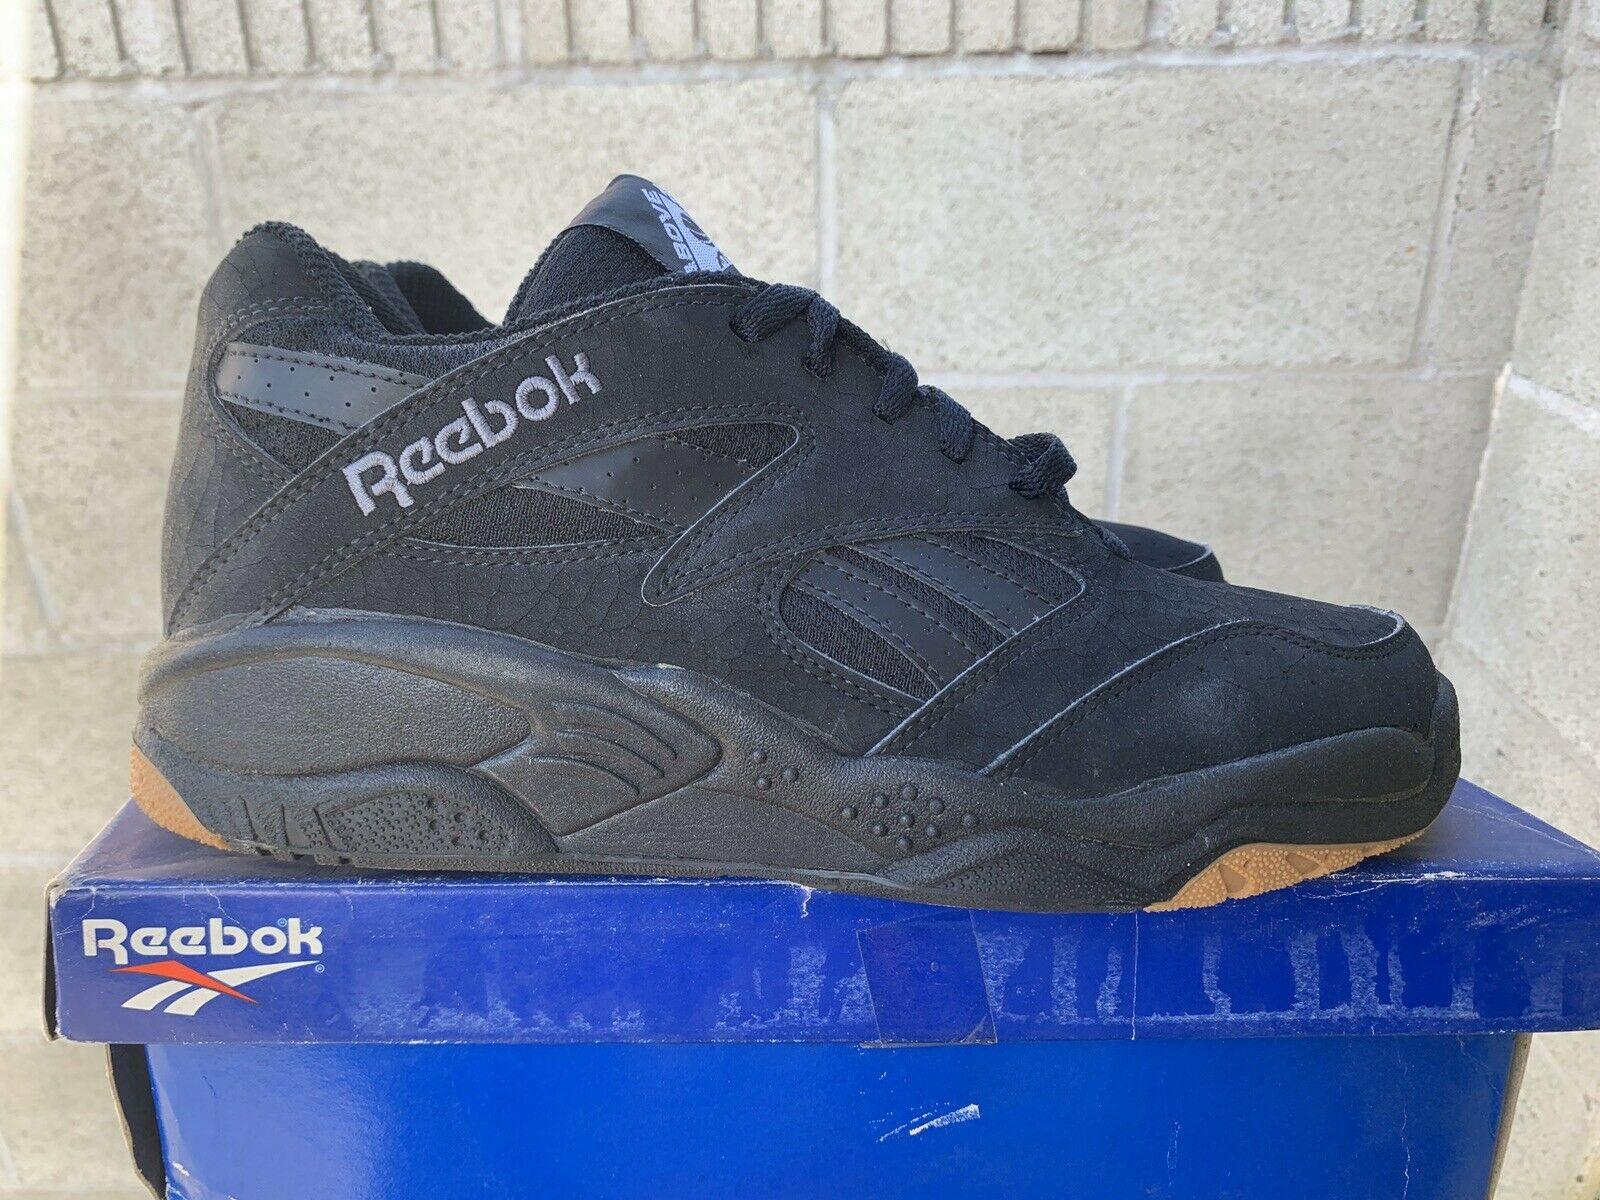 Reebok D-Factor Low